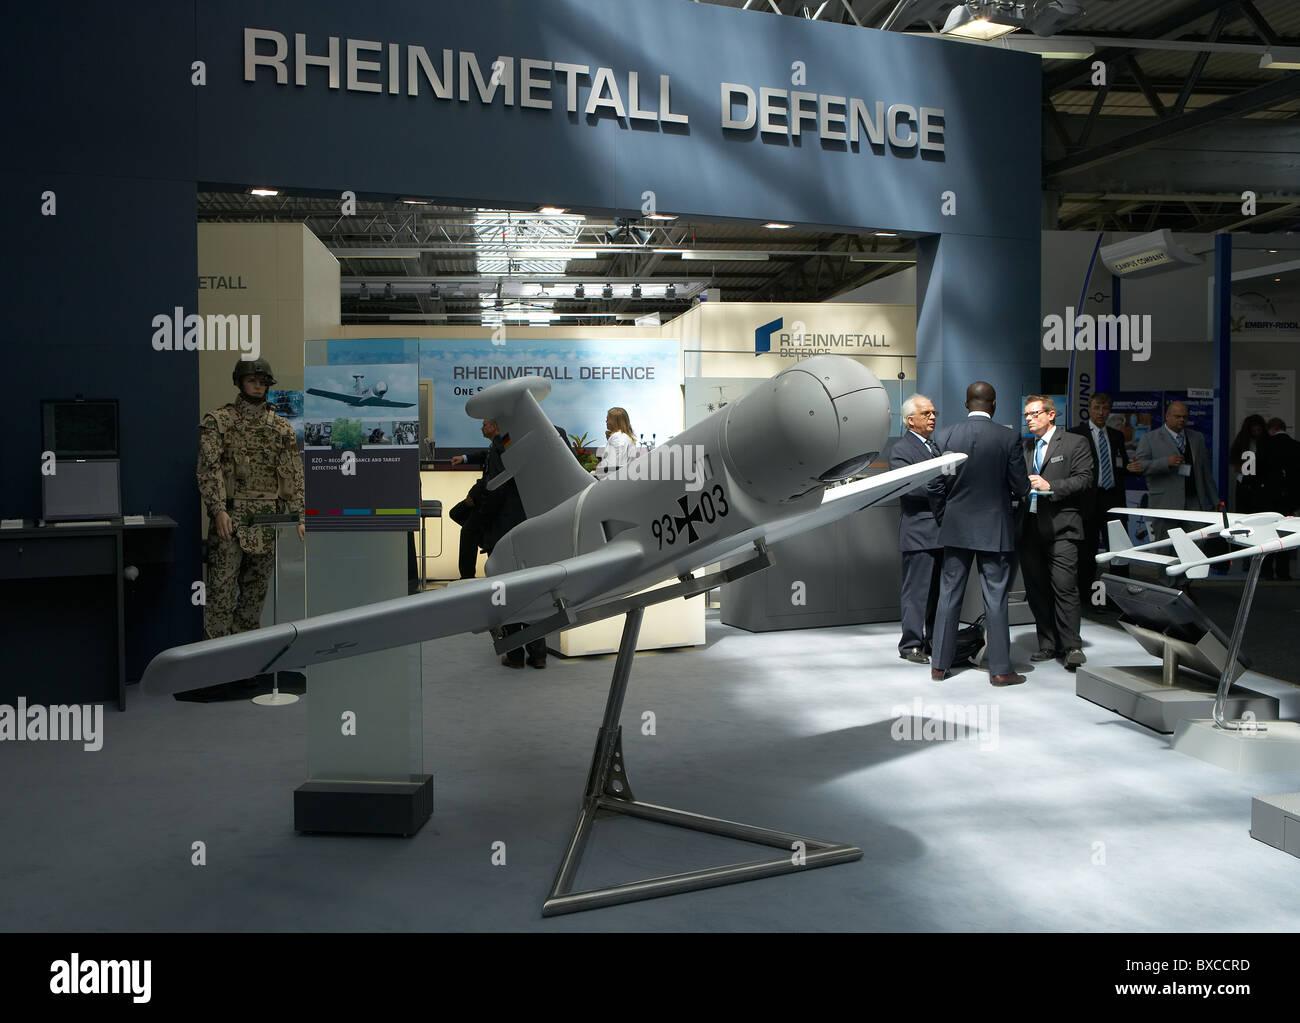 Stand of the Rheinmetall military company, Berlin, Germany - Stock Image